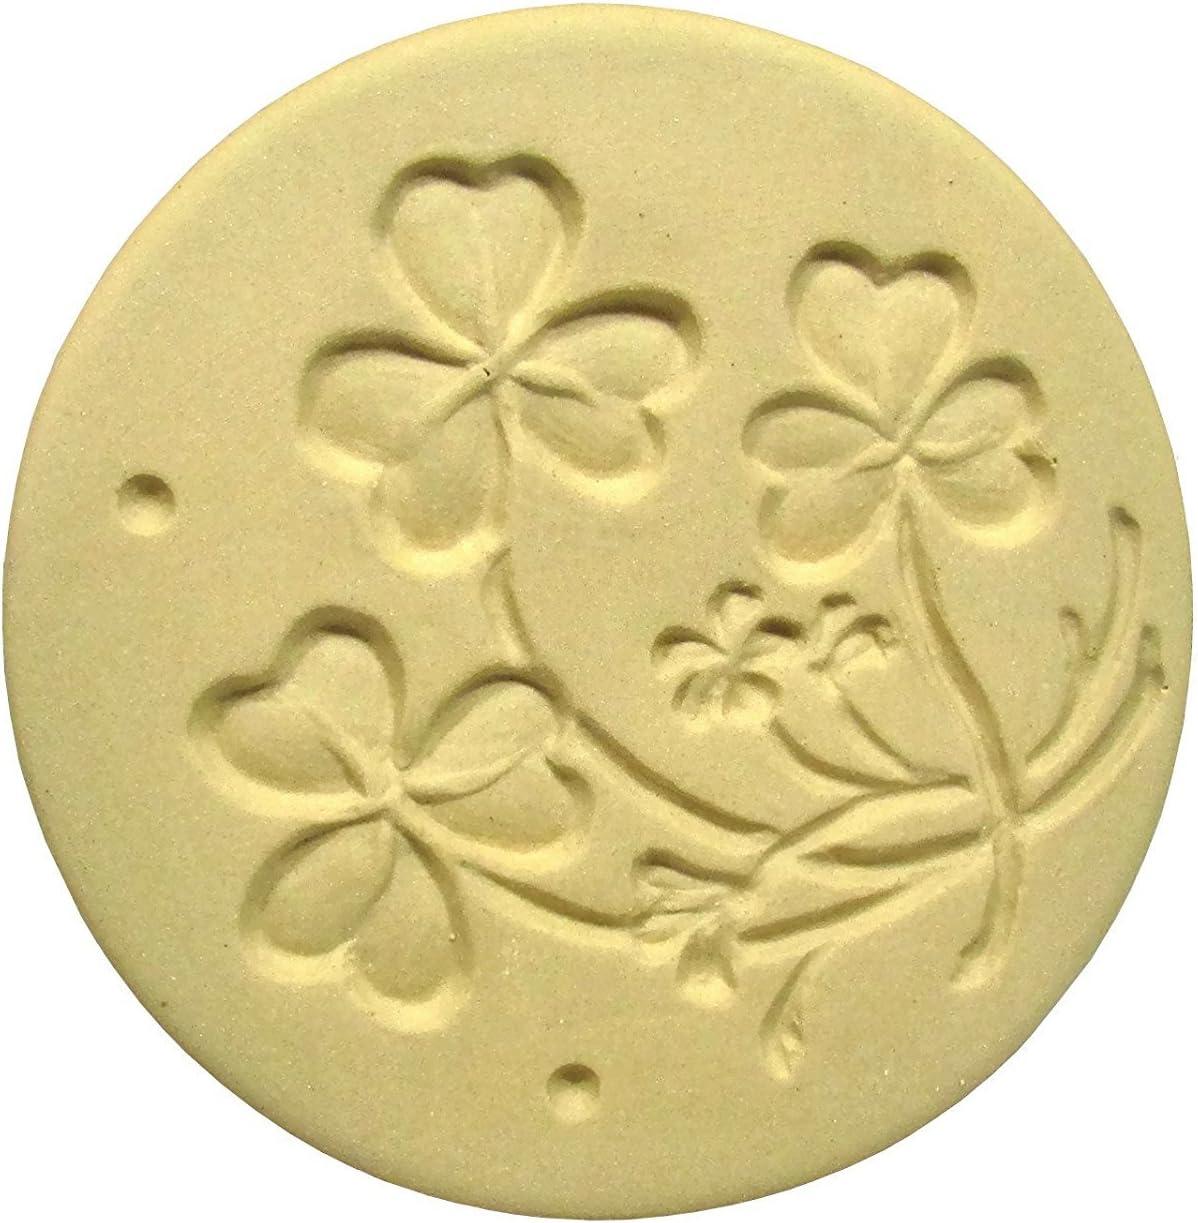 Brown Max 65% OFF Mail order Bag Shamrocks Cookie Stamp Series British Isle -